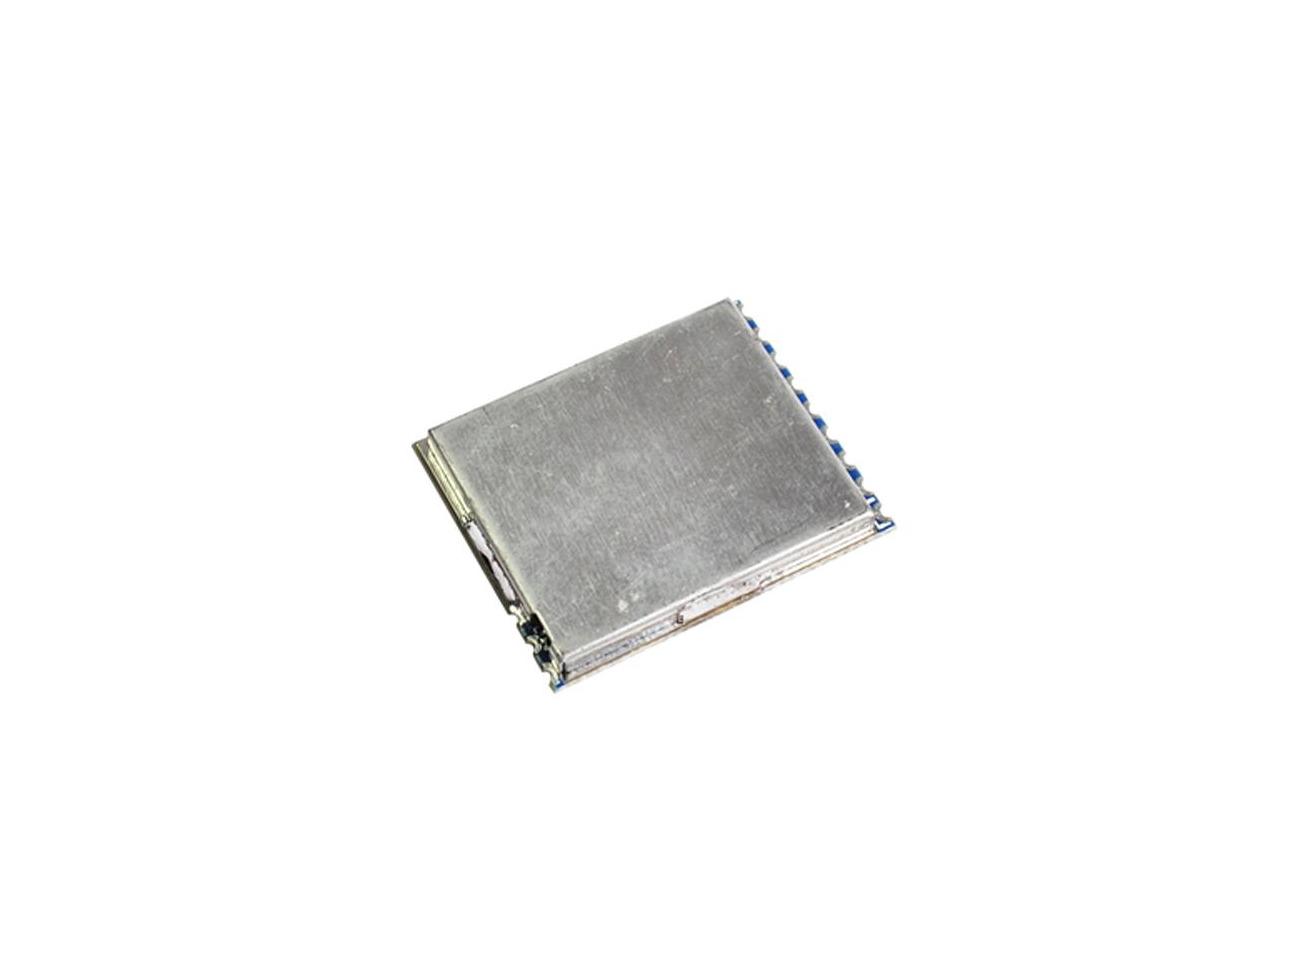 Boscam FPV 5.8G Wireless Audio Video Receiving Module RX5808 for RC Drone FPV Ra